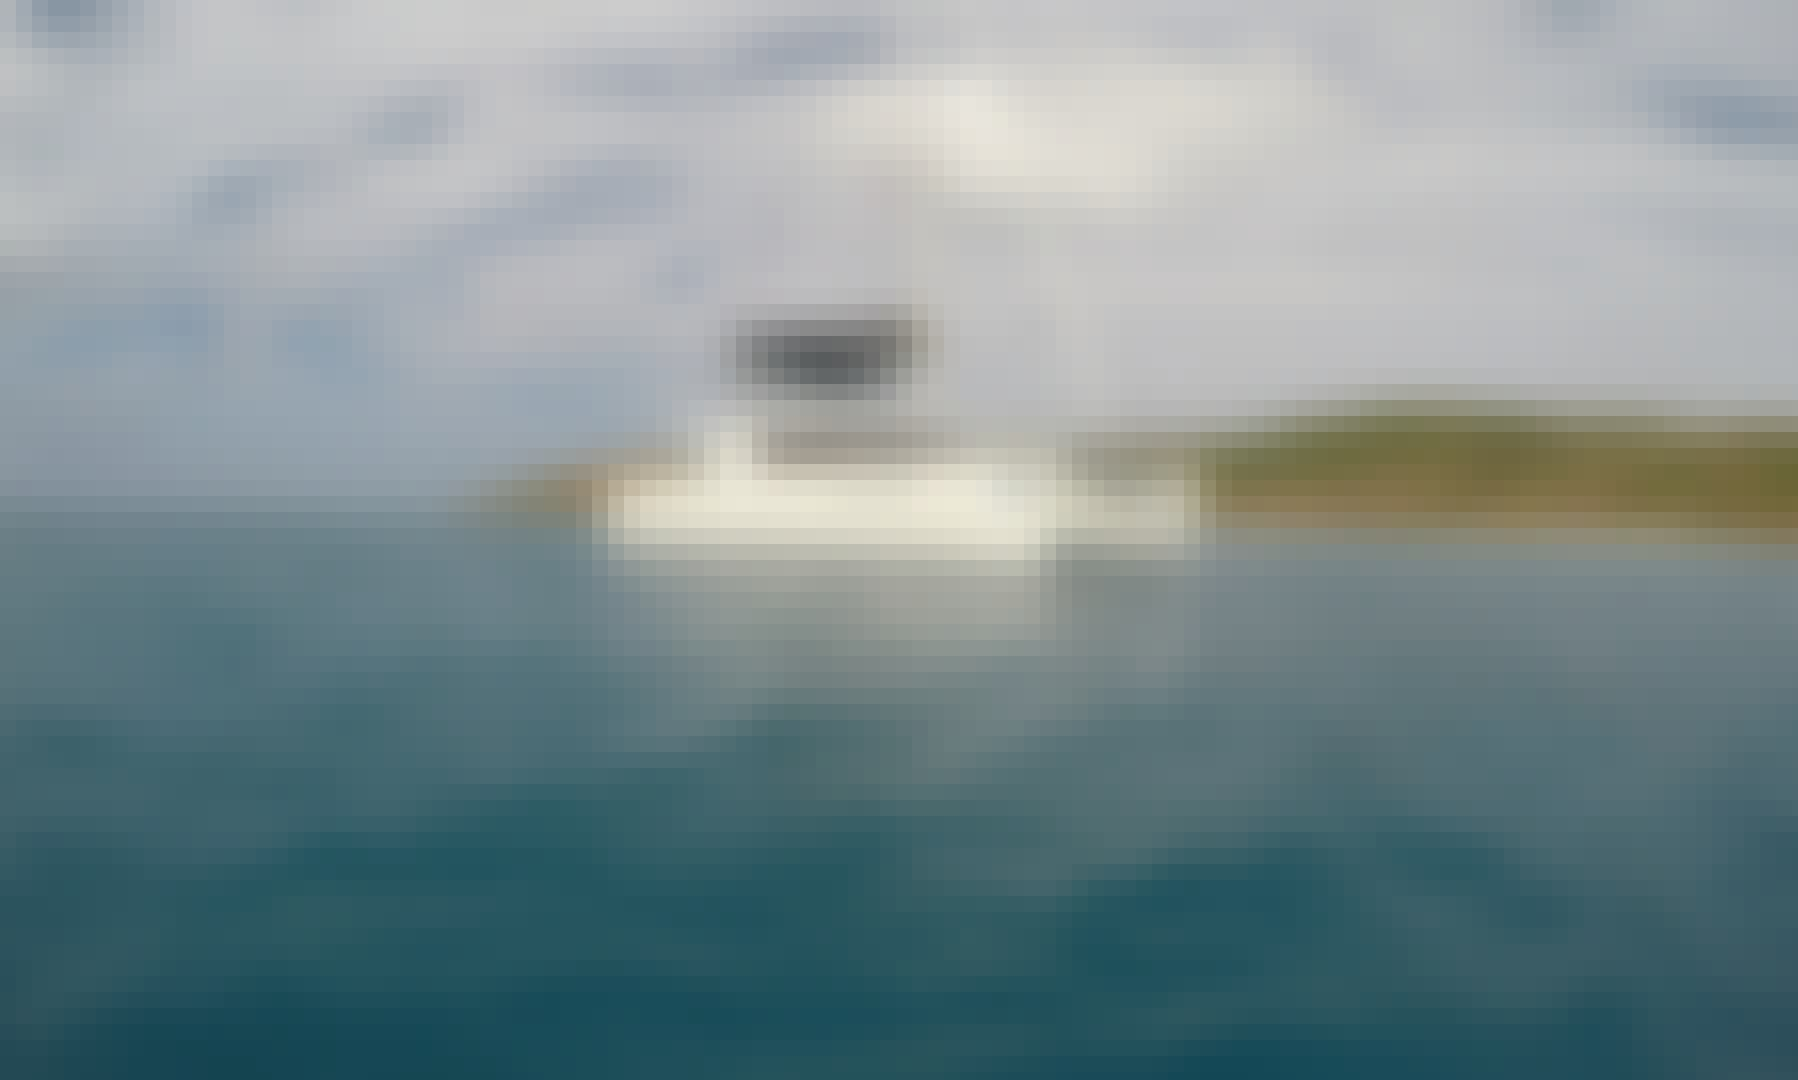 Beautiful Lagoon 450 Catamaran for 10-Person in Tortola, British Virgin Islands!